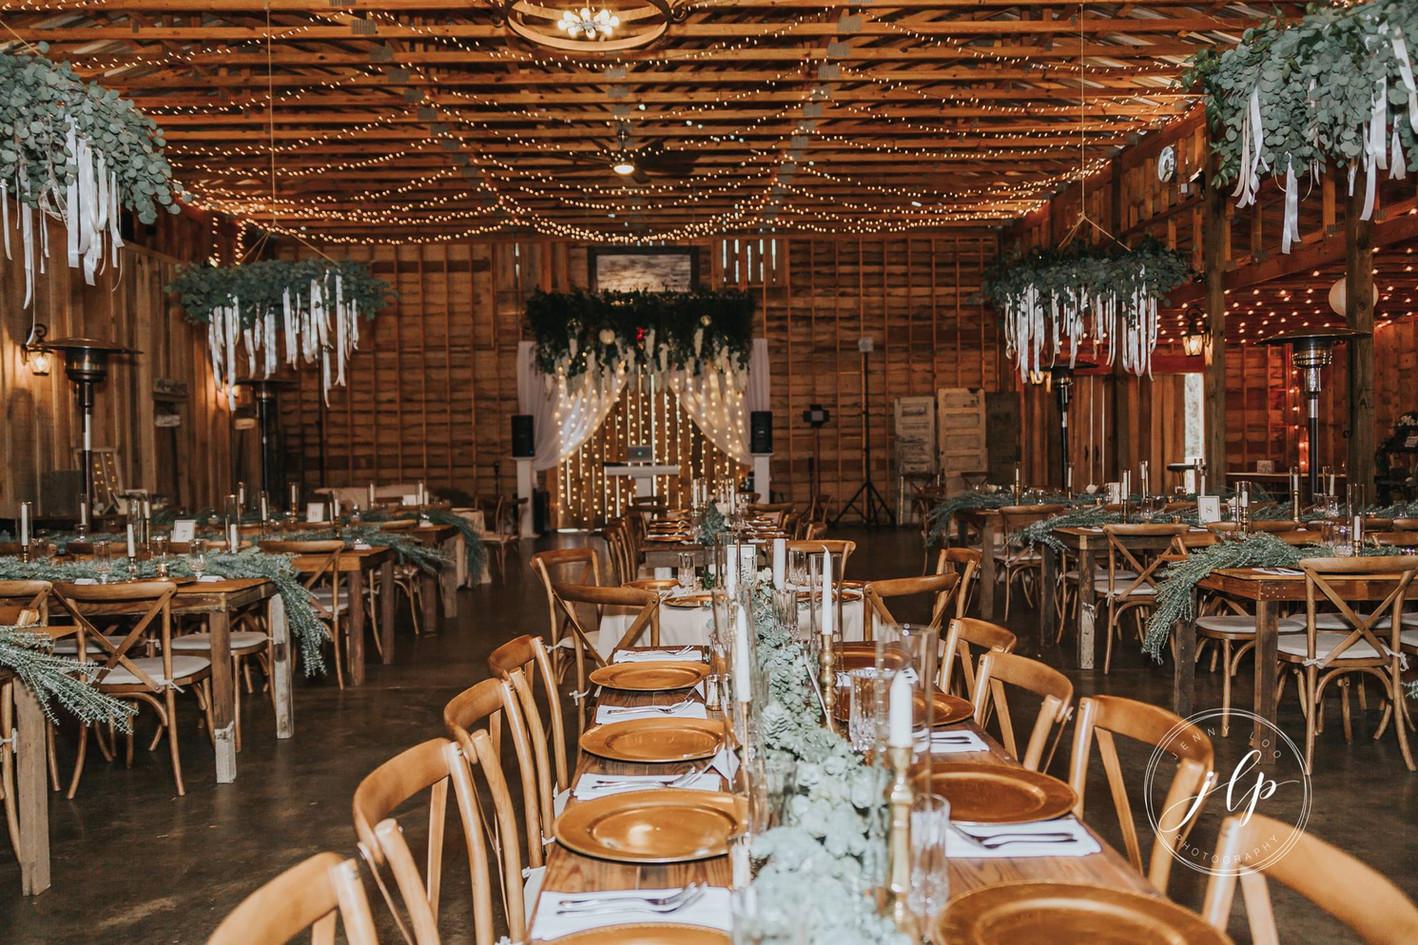 barn for Jacey's wedding.jpg